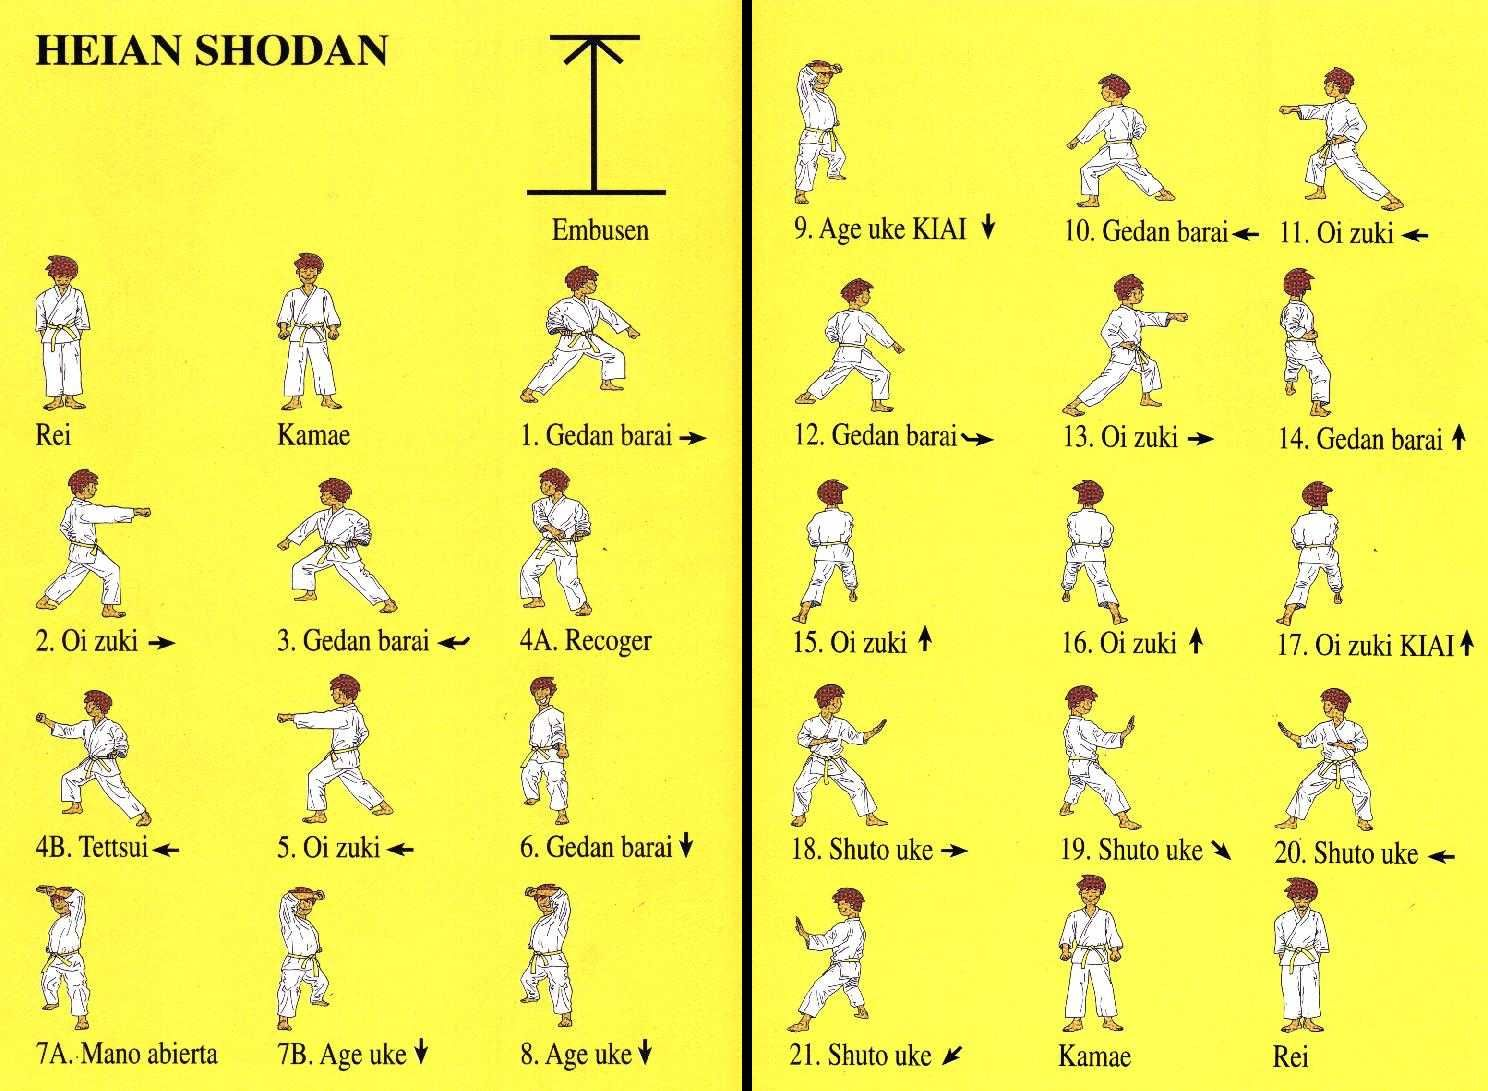 7928f61f1e78 Wkf Karate, Karate Dojo, Karate Club, Karate Classes, Karate Kata, Karate